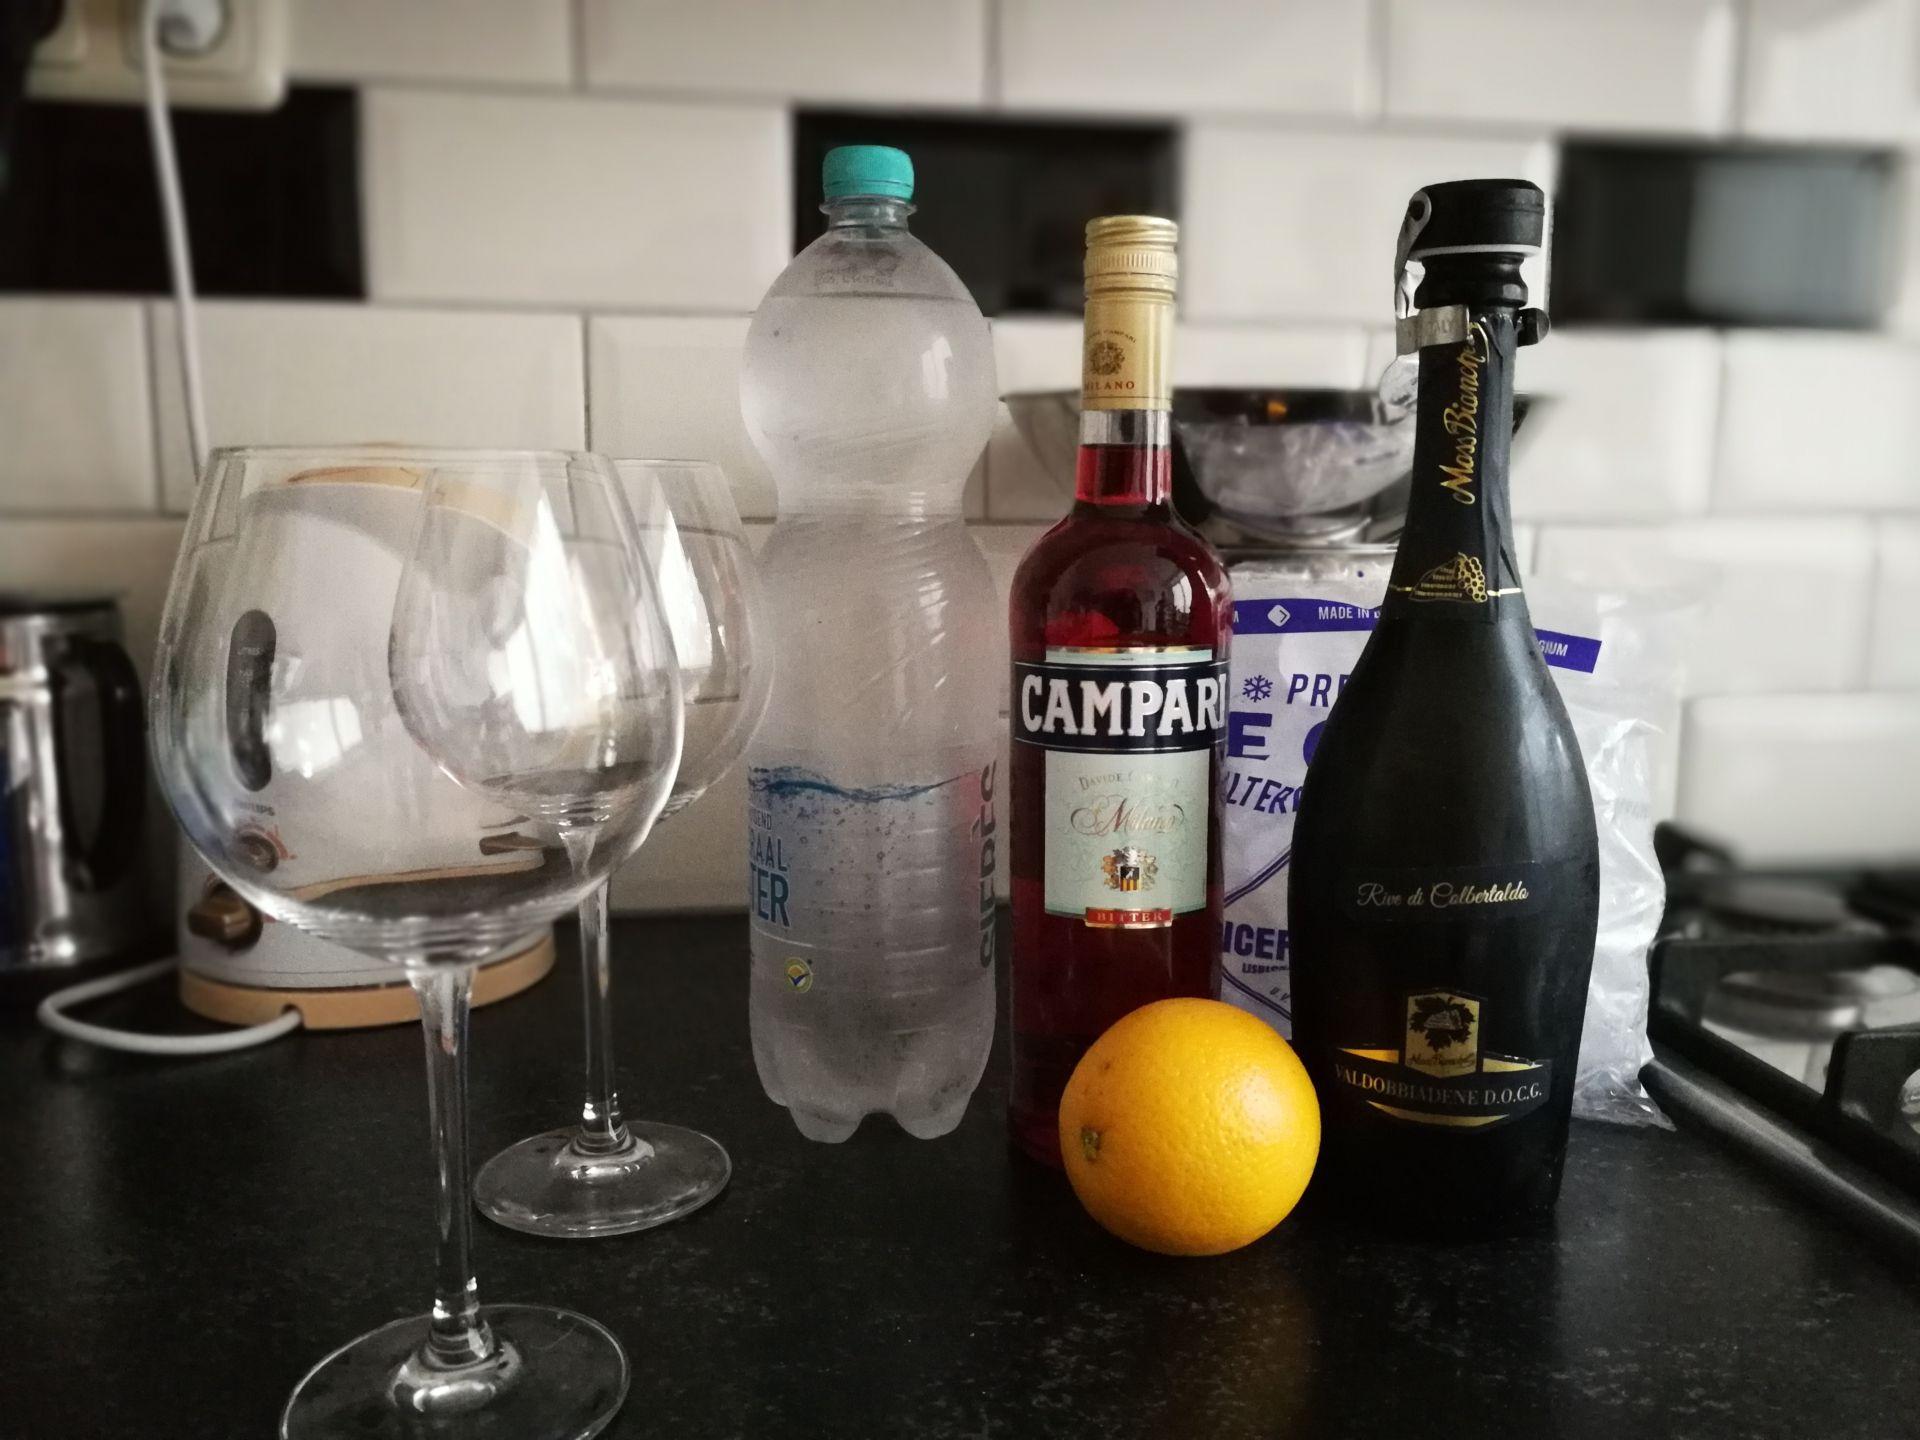 Ingrediënten Campari Spritz Prosecco sinaasappel koolzuurhoudend water recept